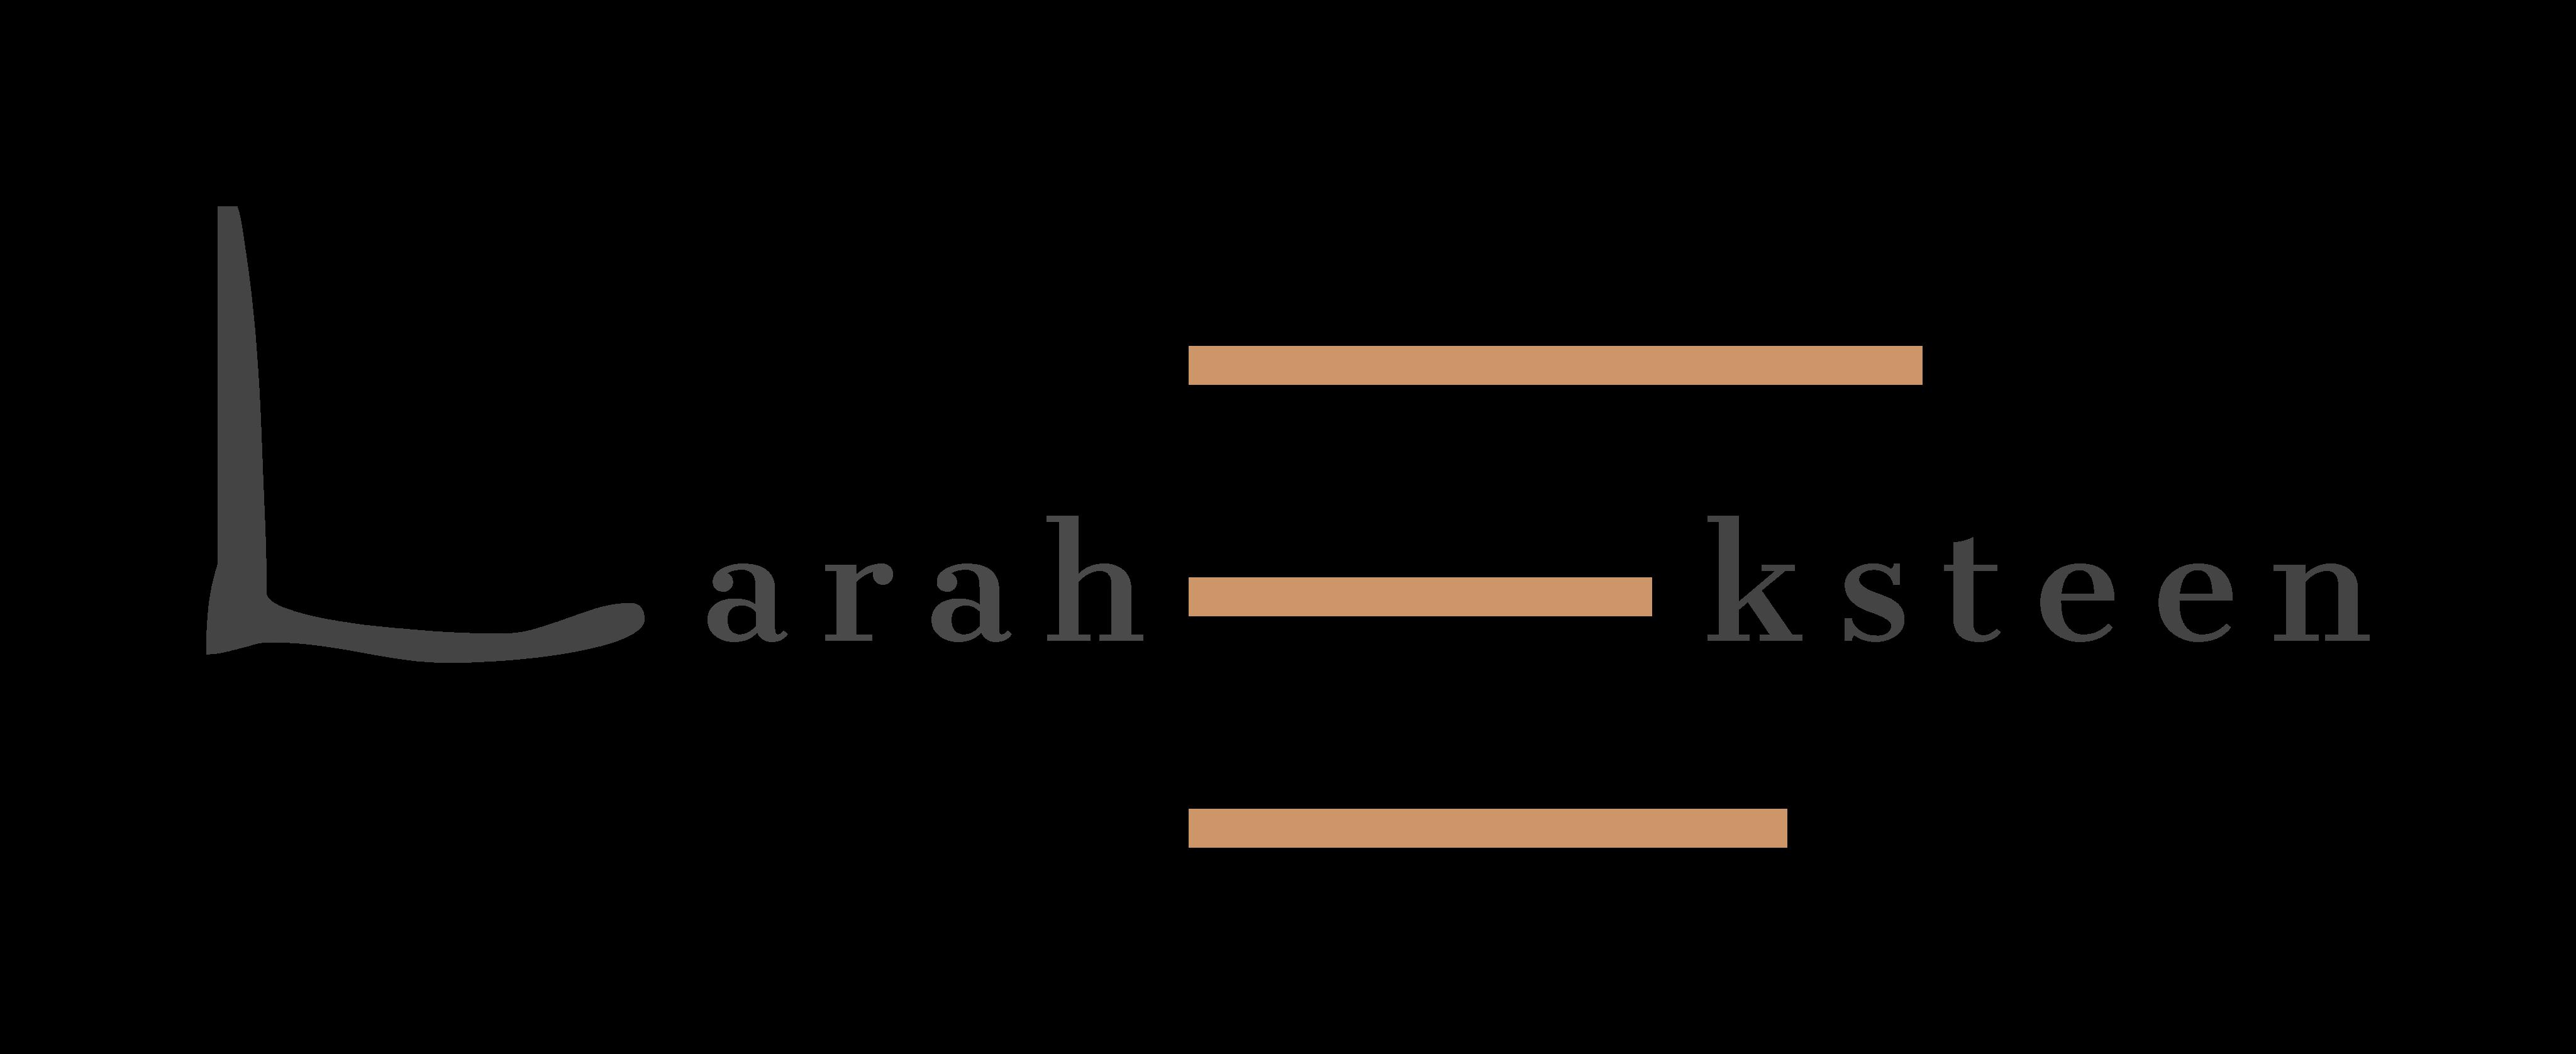 Larah Eksteen